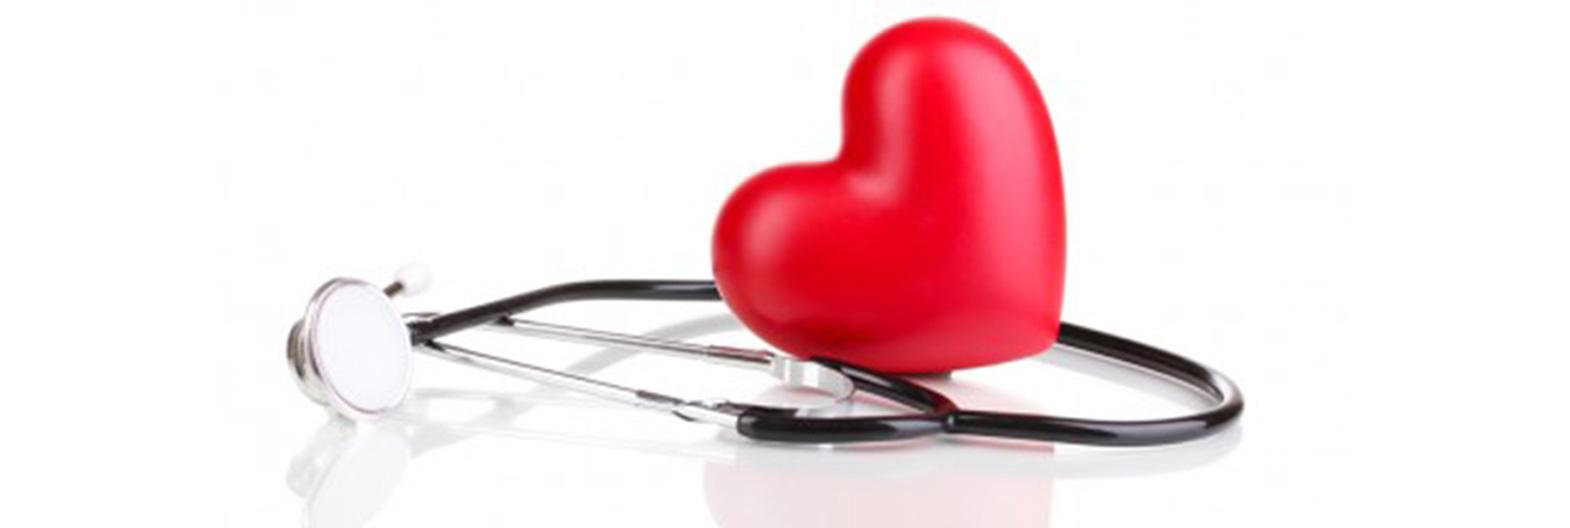 kas yra hipertenzija hipertenzija